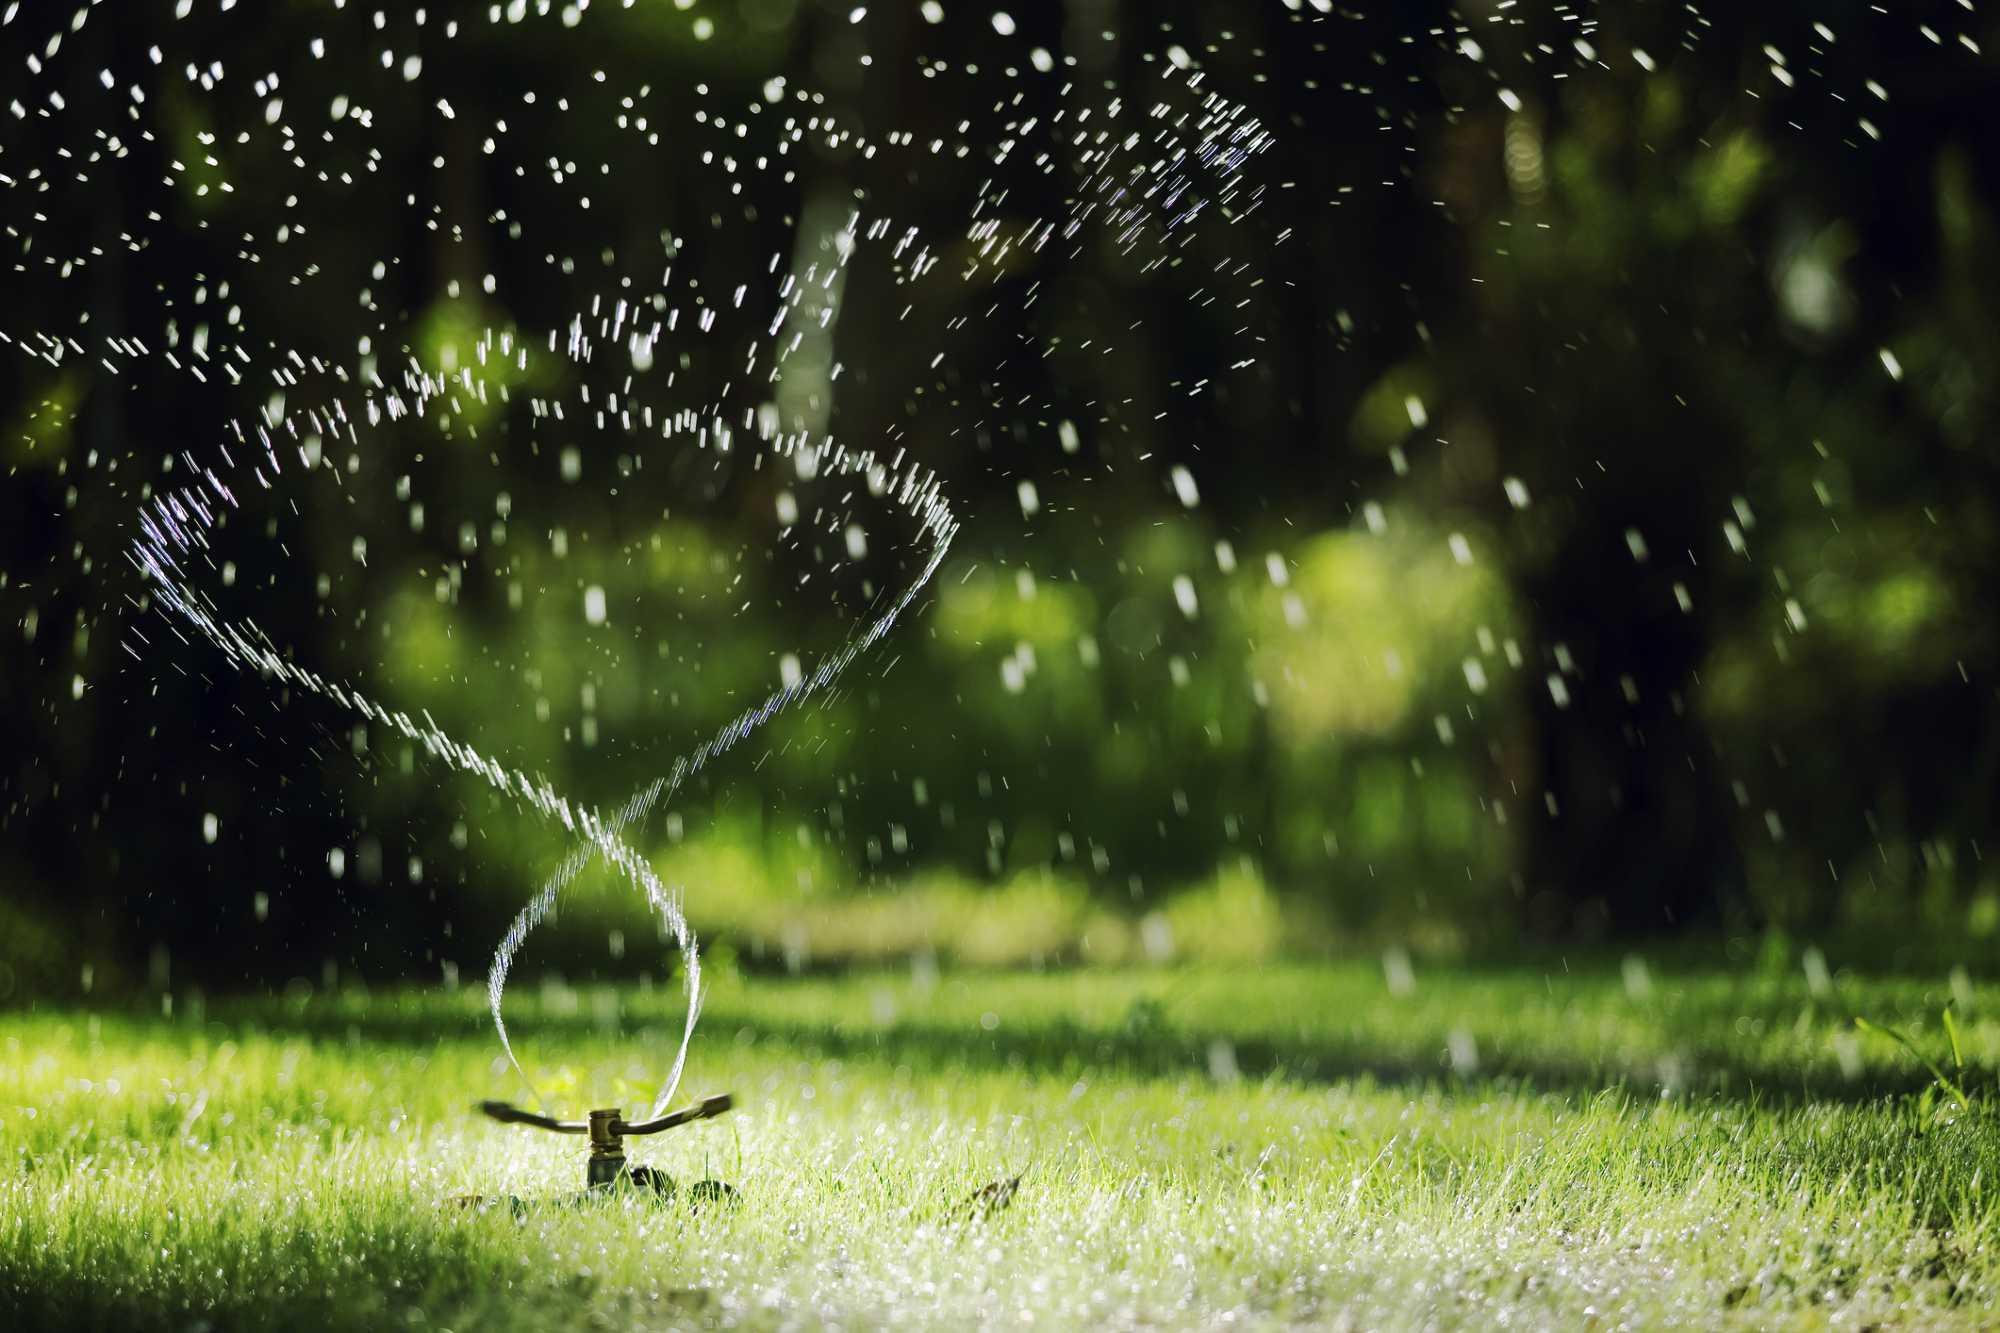 irrigazione SVAI_irrigazione girandola giardino